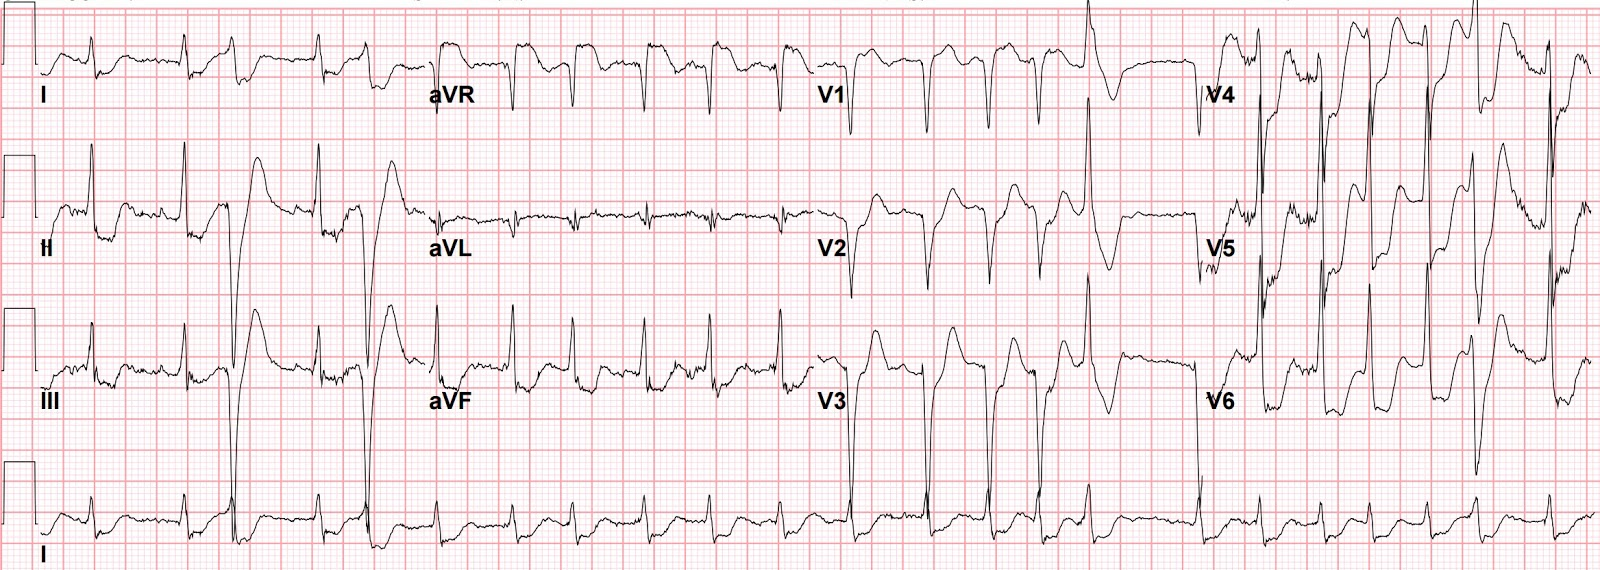 Understanding Atrial Fibrillation picture